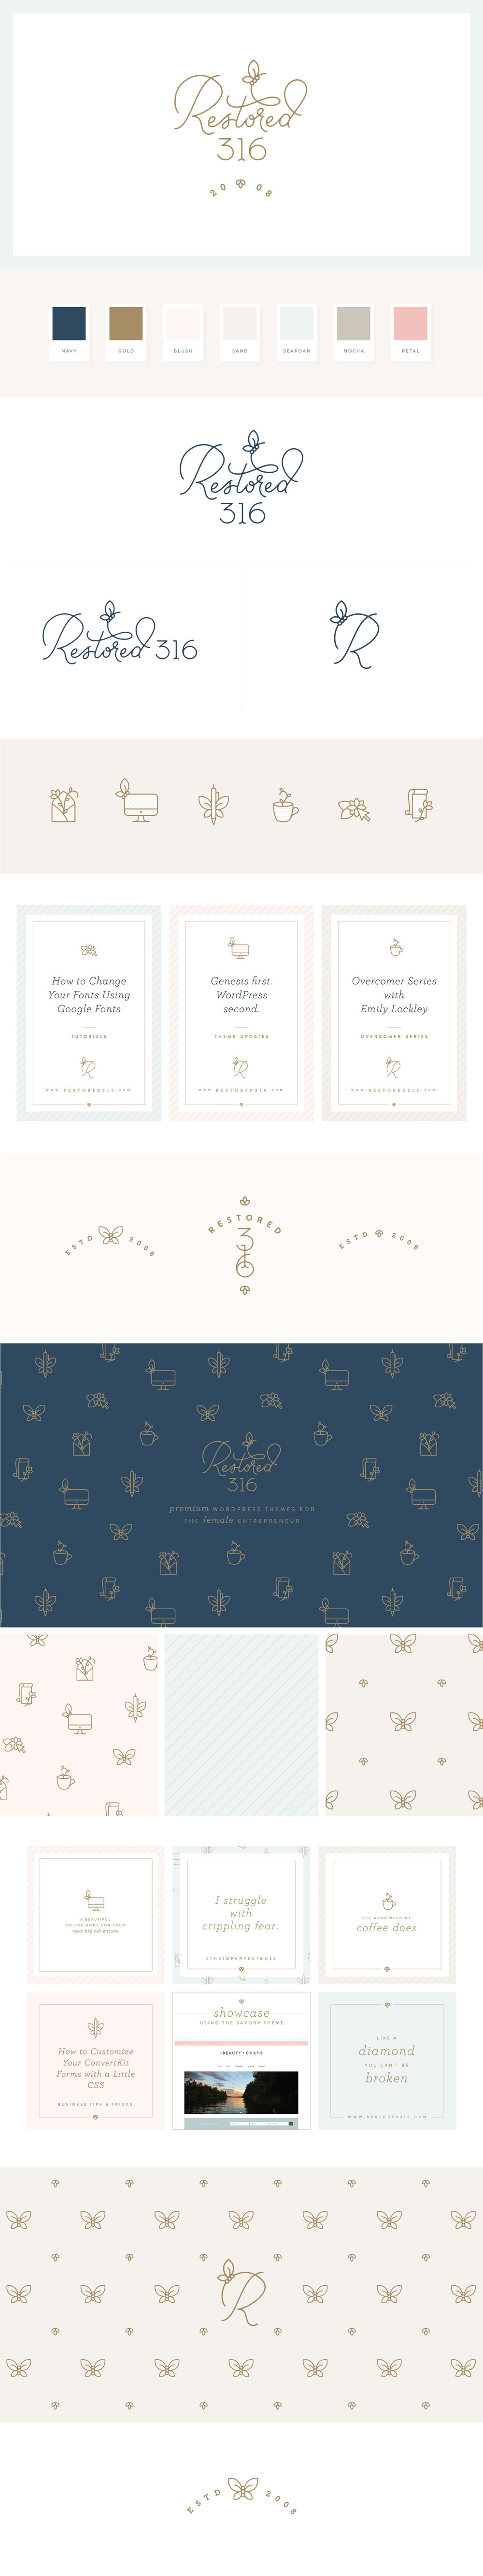 Restored 316 -logo &brand identity design by Melissa Yeager